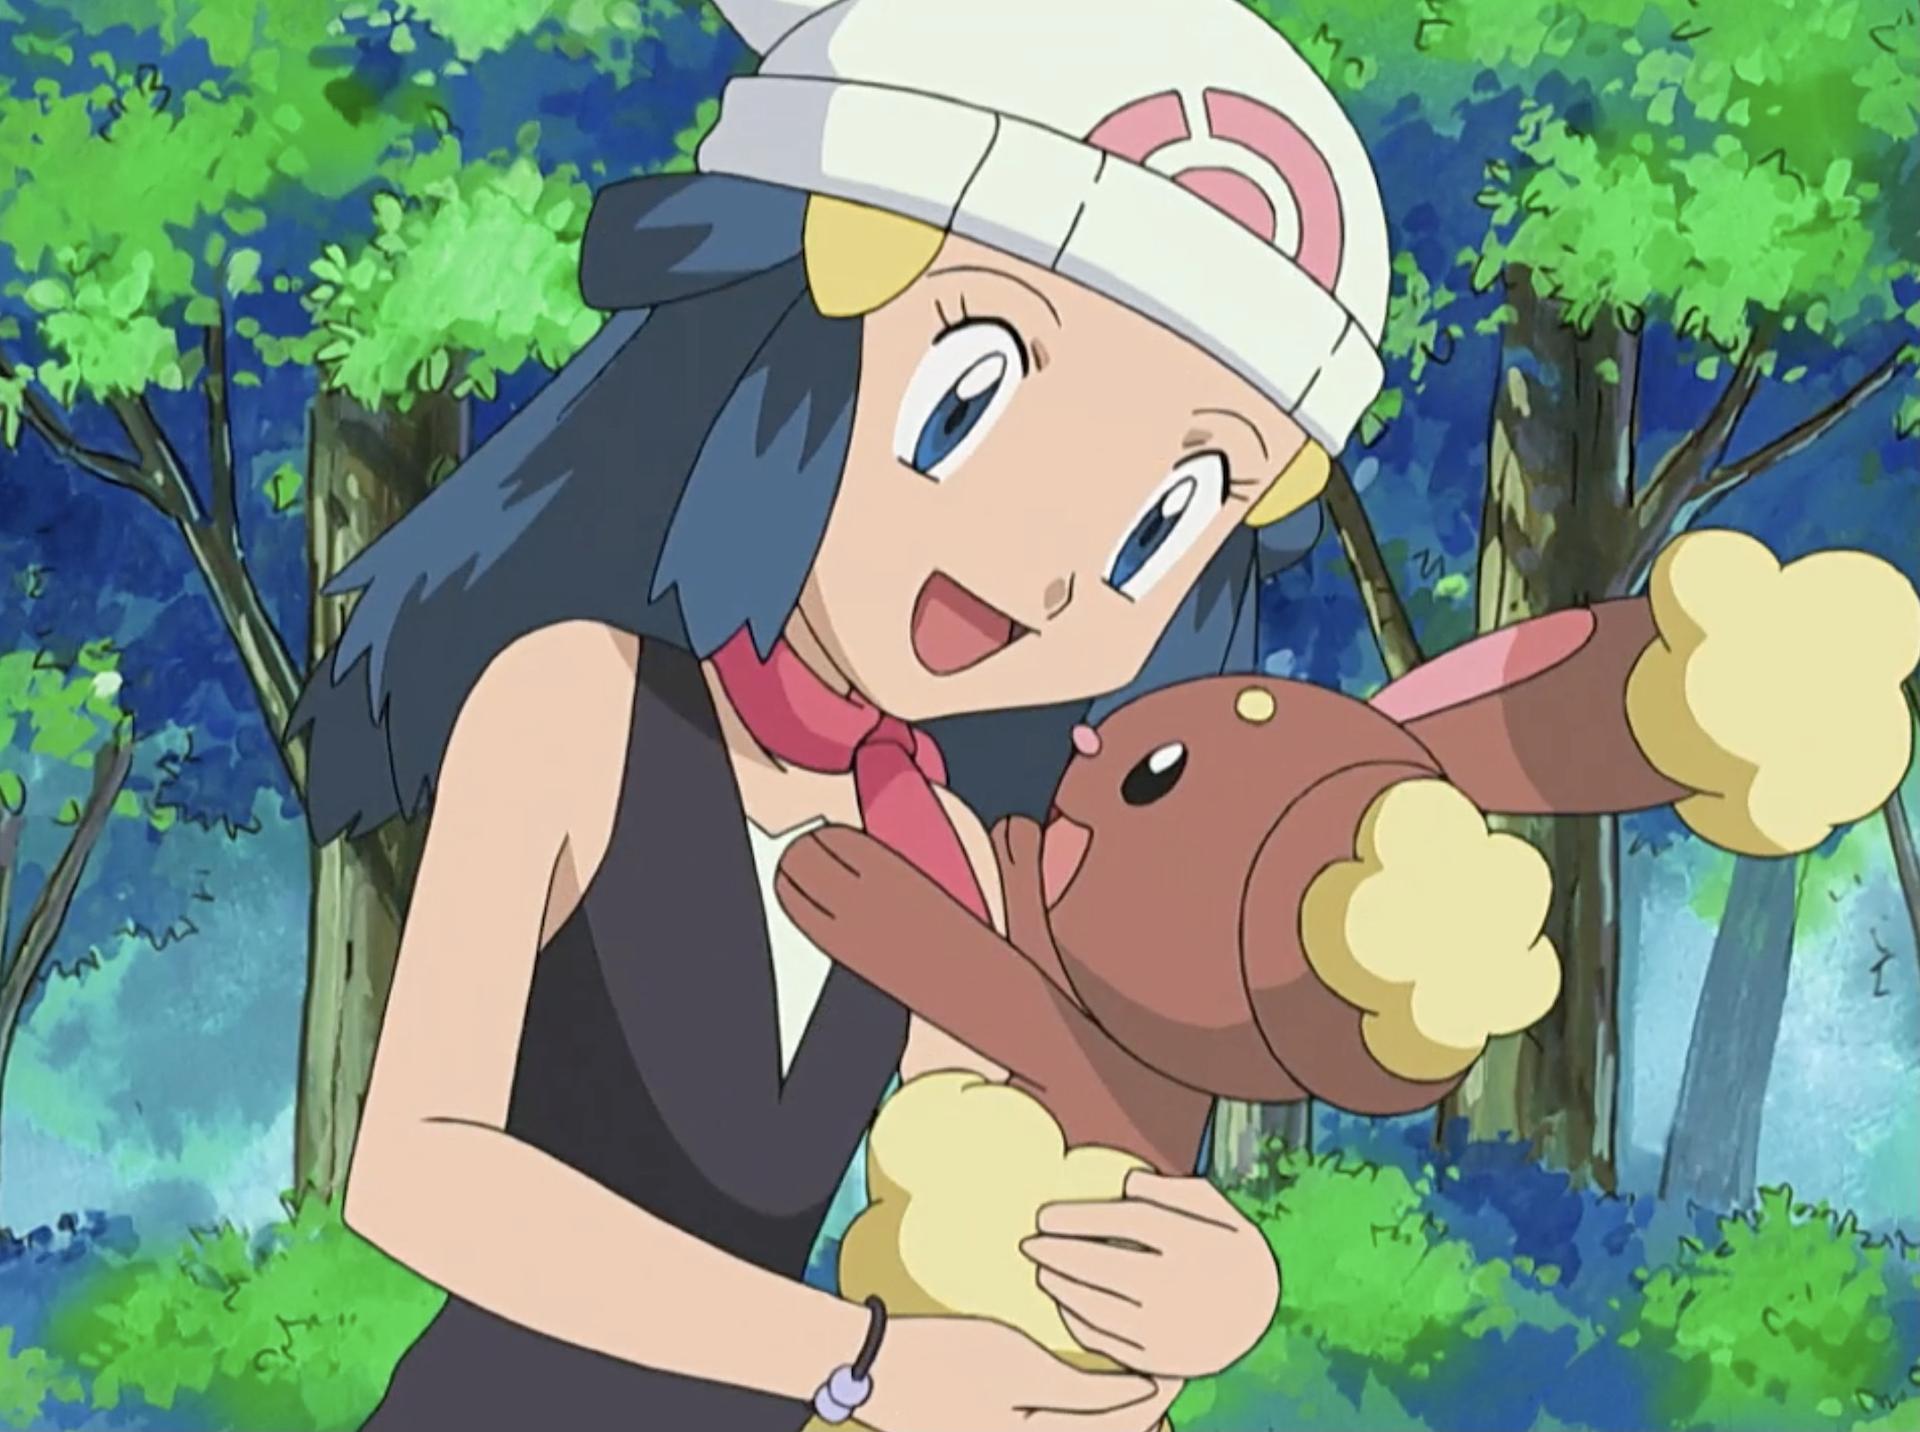 Dp009 Setting The World On Its Buneary Pokémon Wiki Fandom